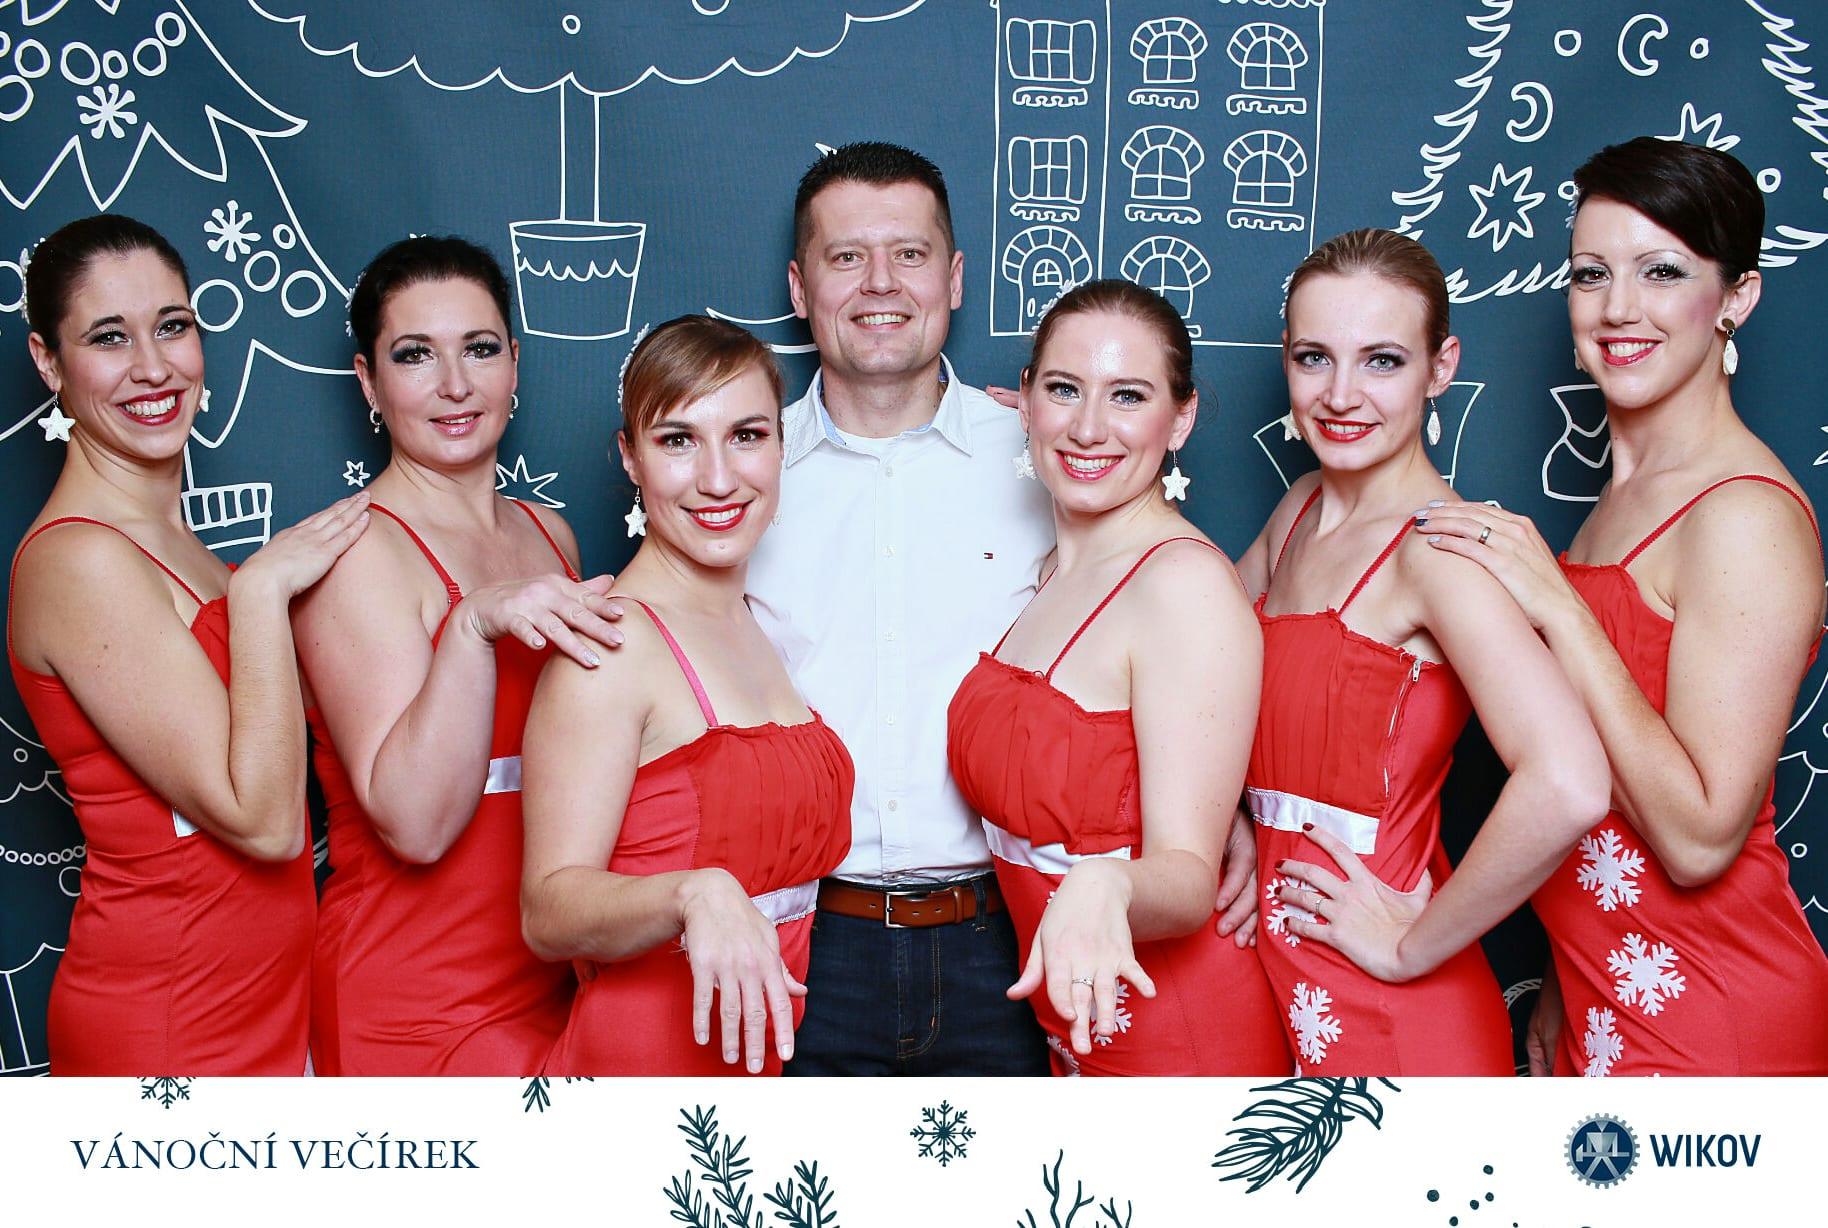 fotokoutek-wikov-7-12-2018-537847